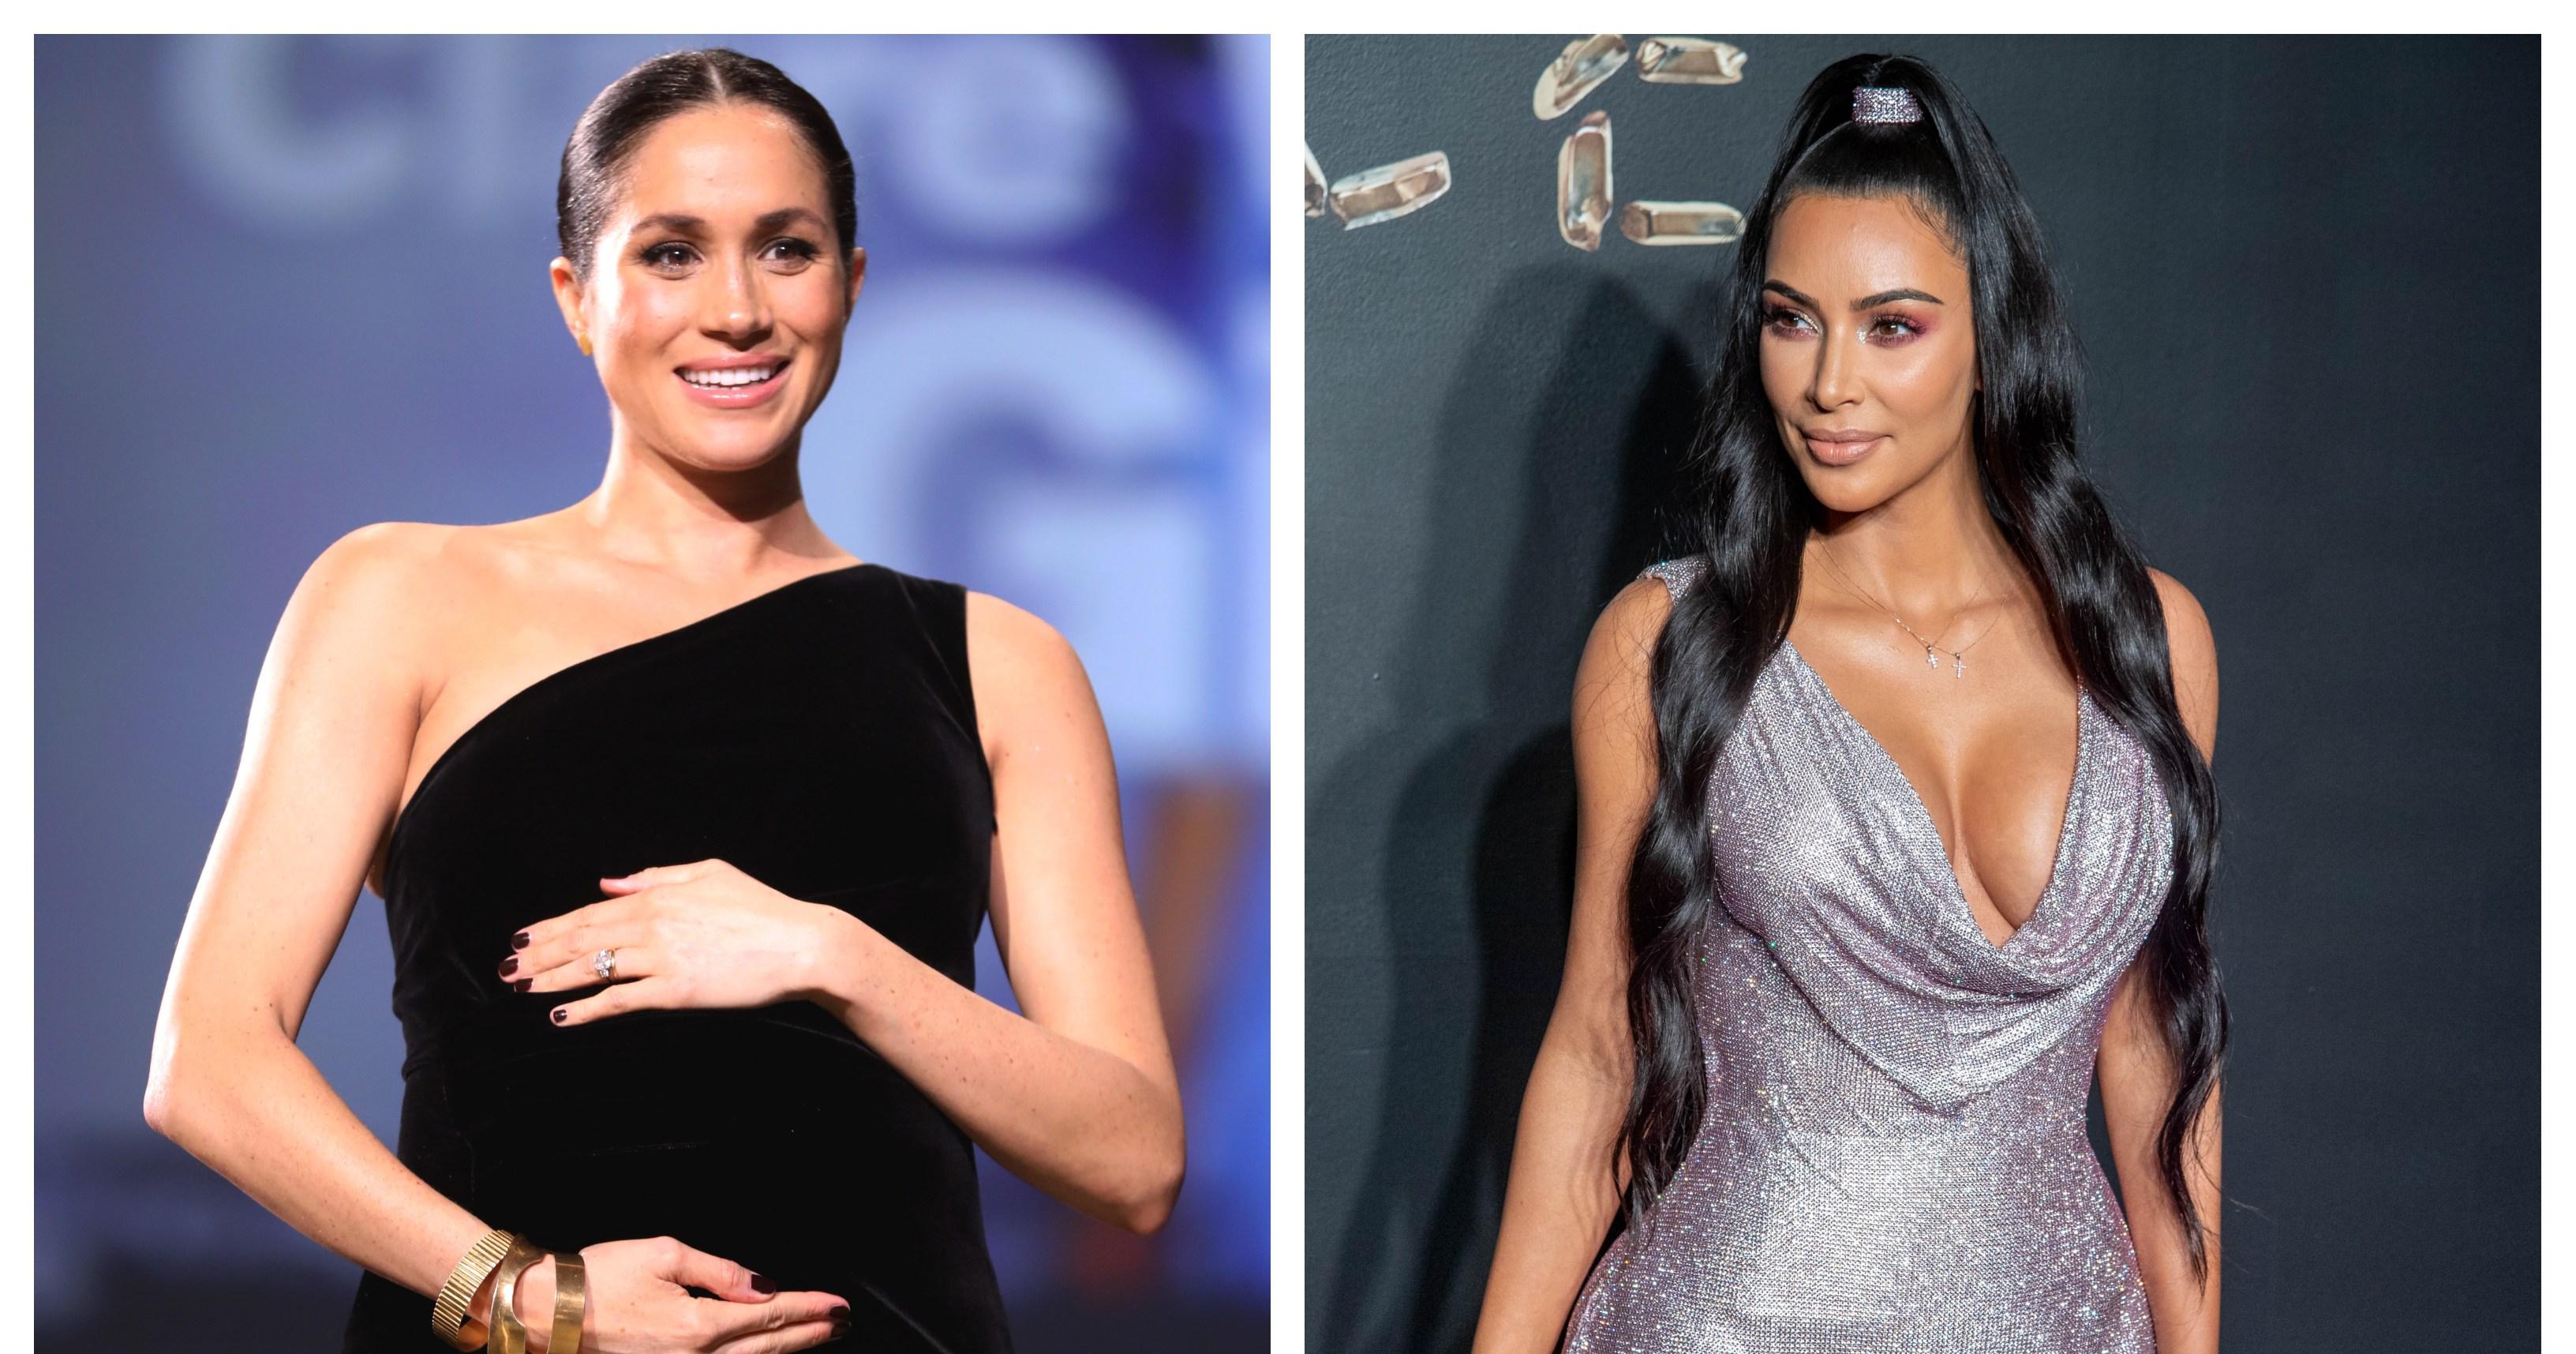 Kim Kardashian Wants To Send Meghan Markle A 'Truly Impressive' Baby Gift, Source Says